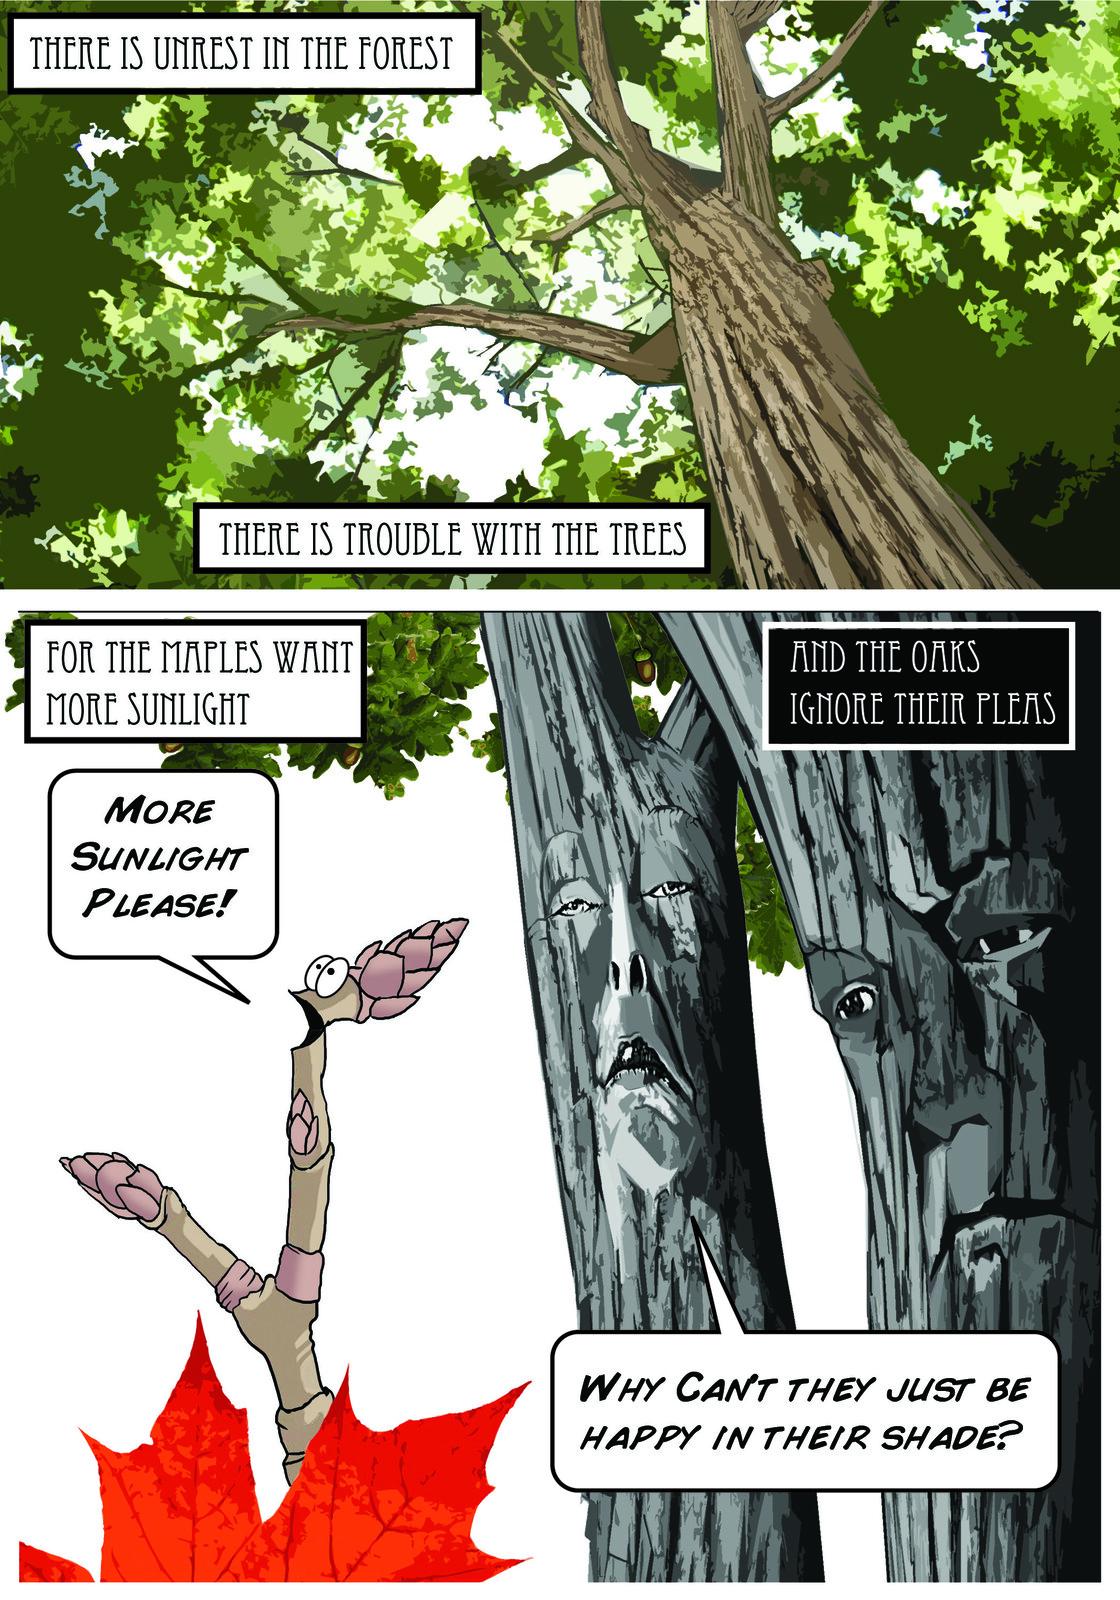 RUSH - The Trees